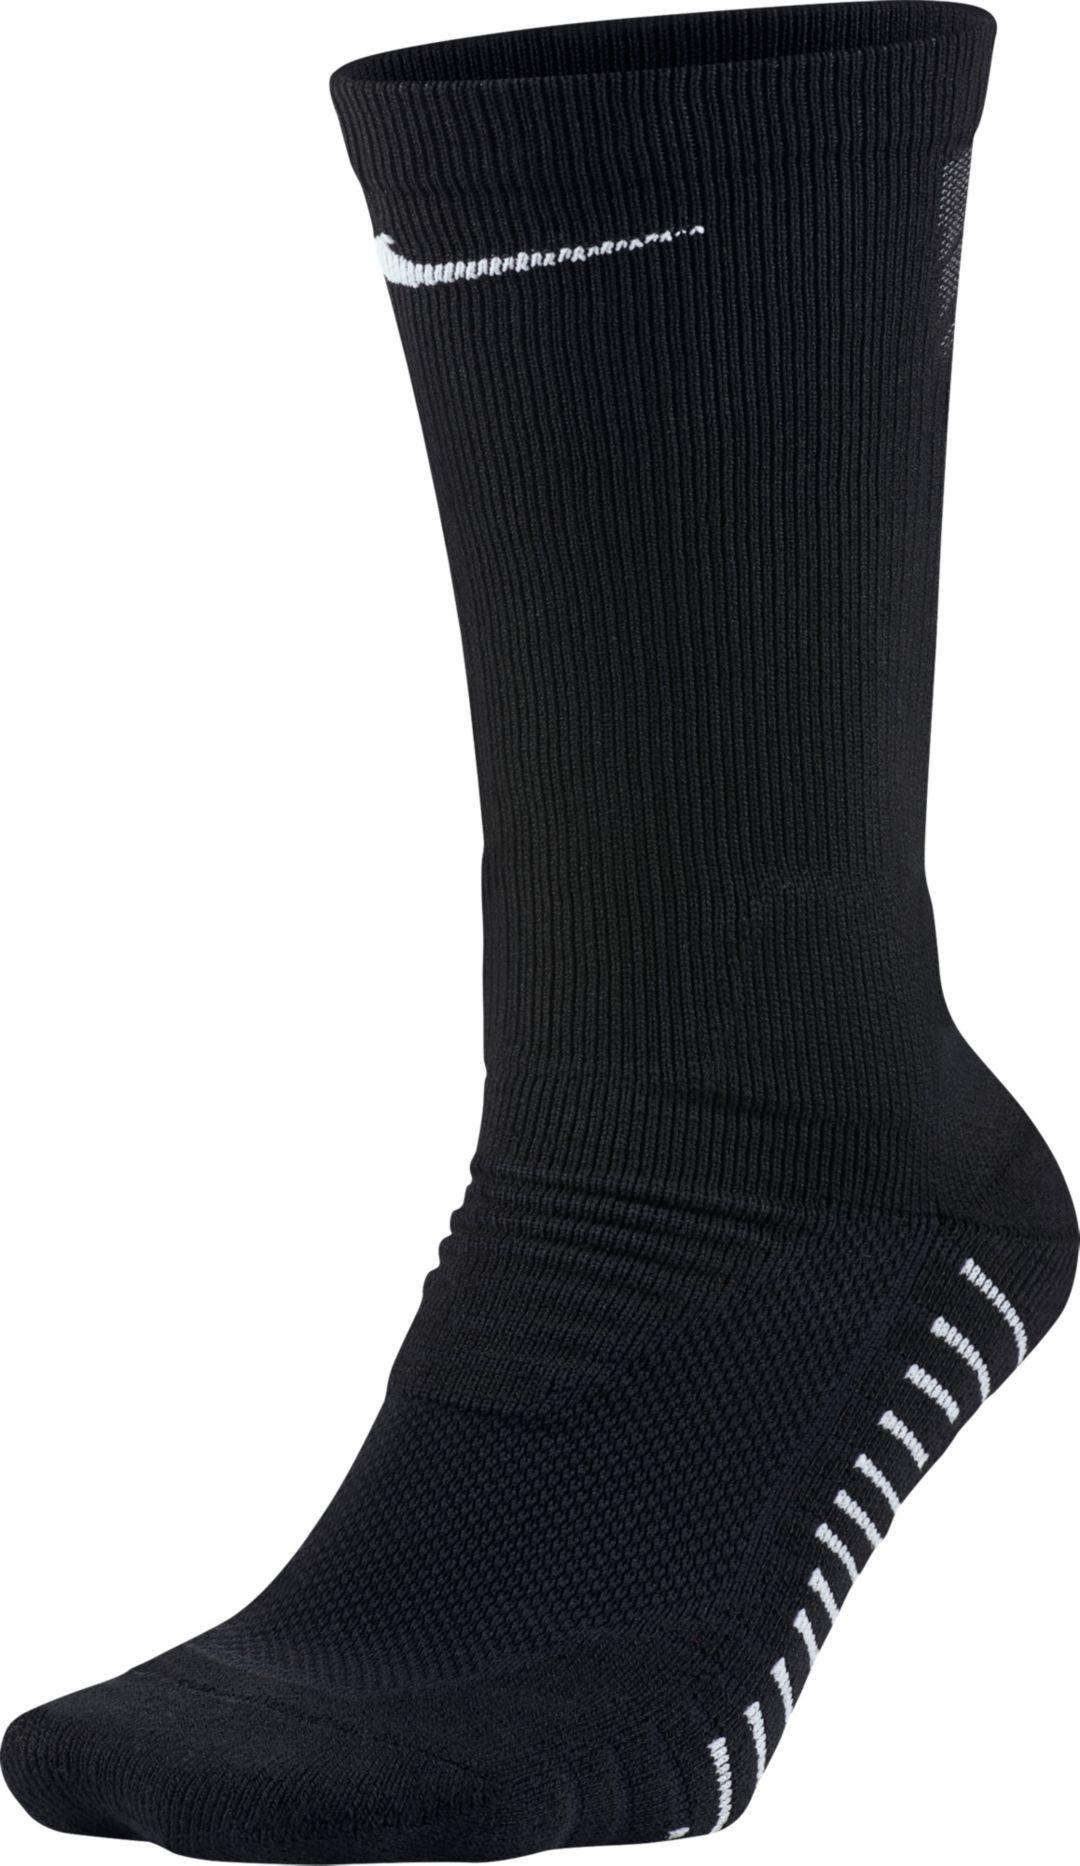 e8295b4cea80d Nike Vapor Crew Socks